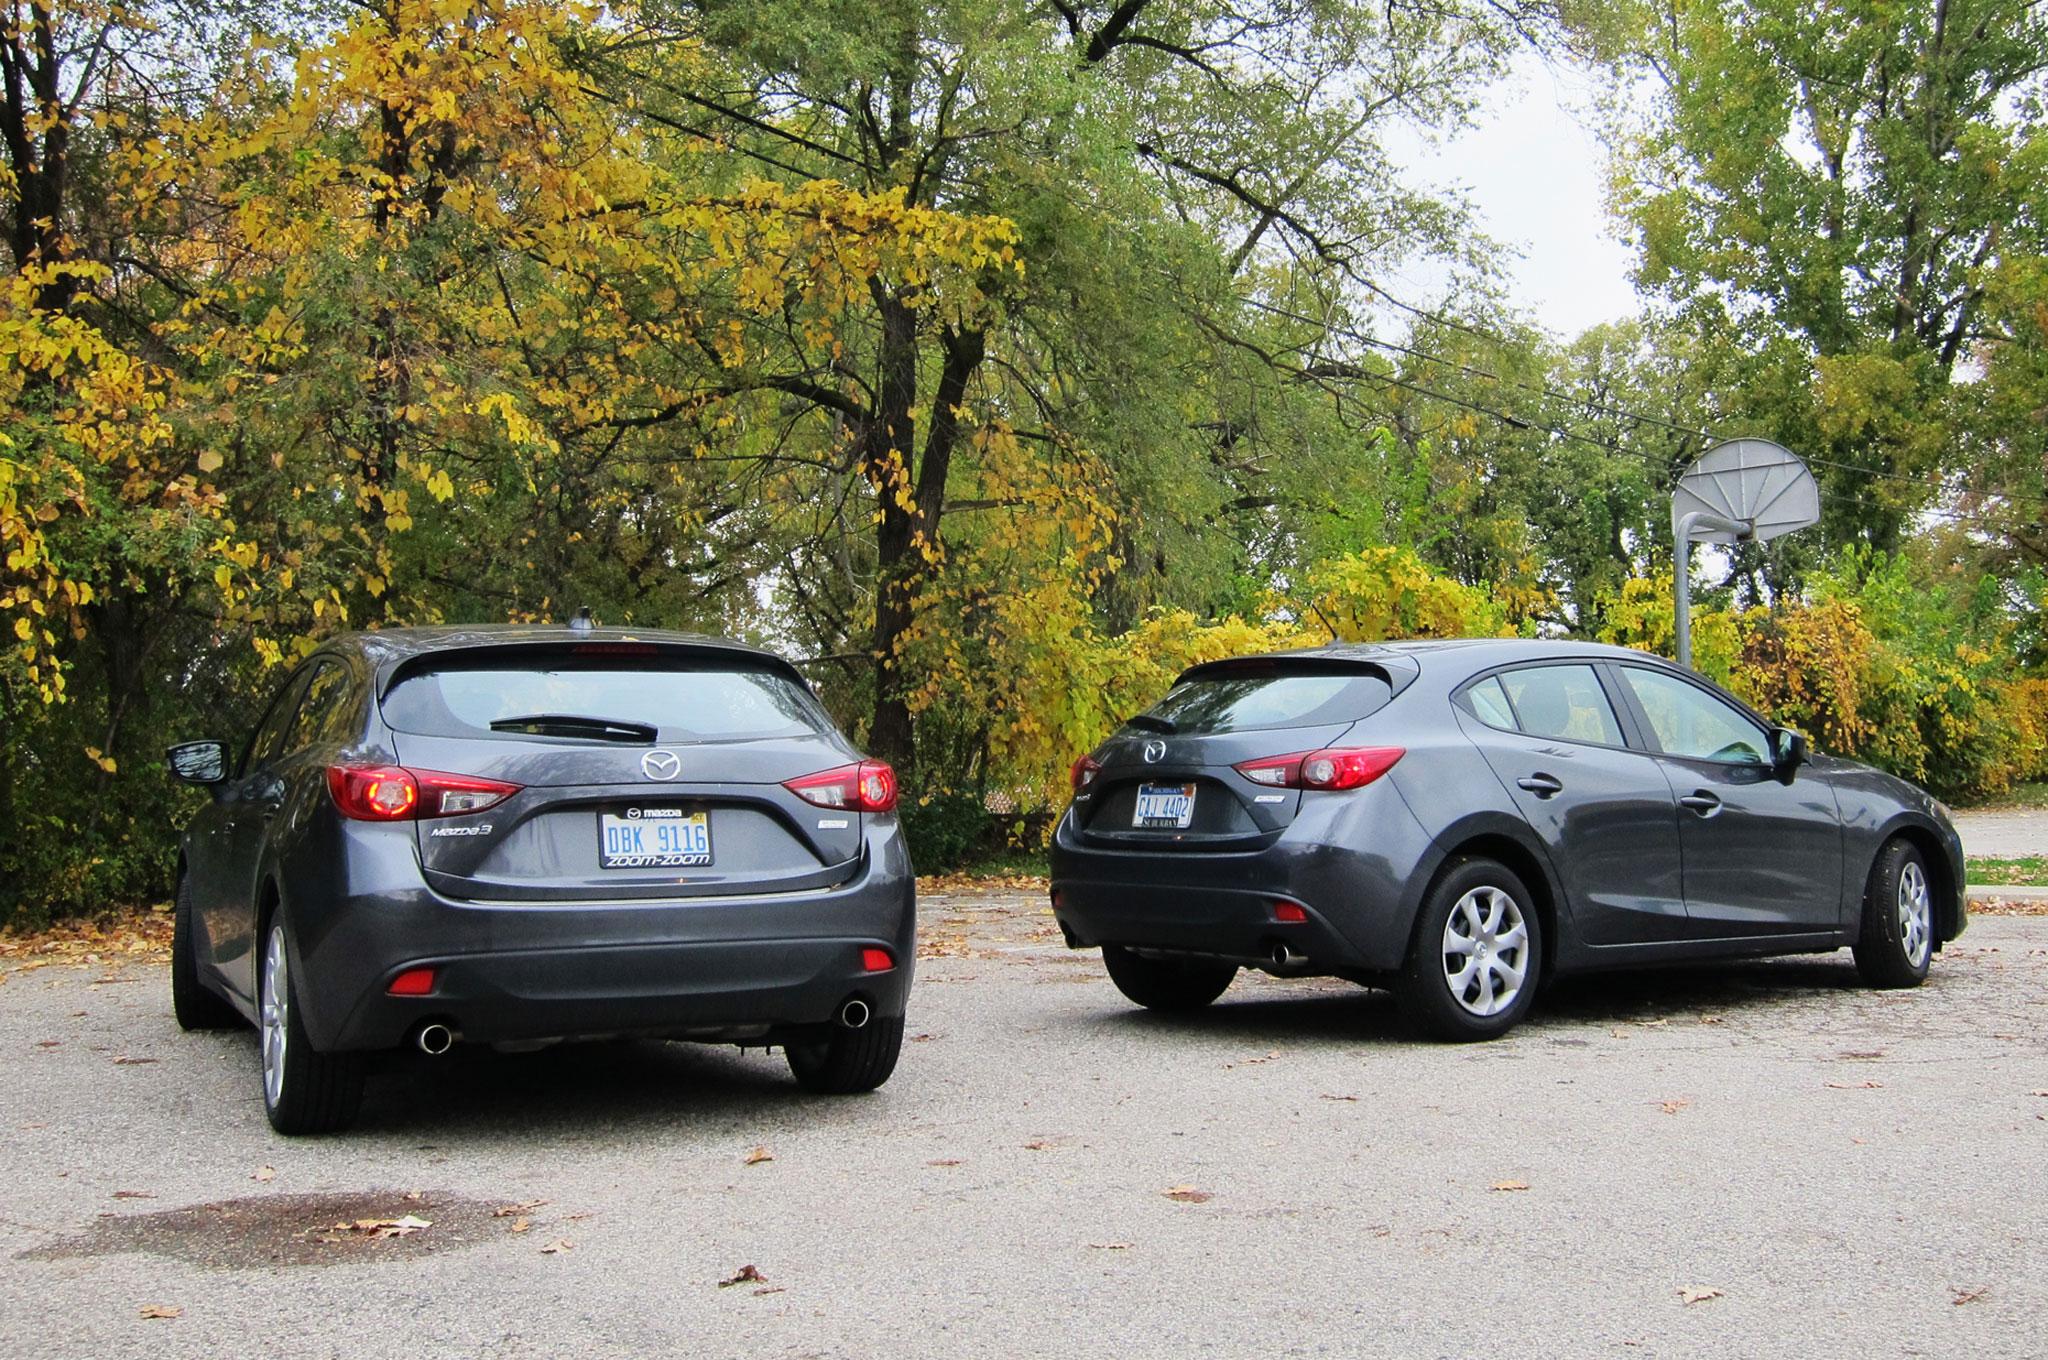 http://st.automobilemag.com/uploads/sites/11/2015/01/2014-Mazda-3-s-Touring-rear-three-quarter-view-model-set-2.jpg